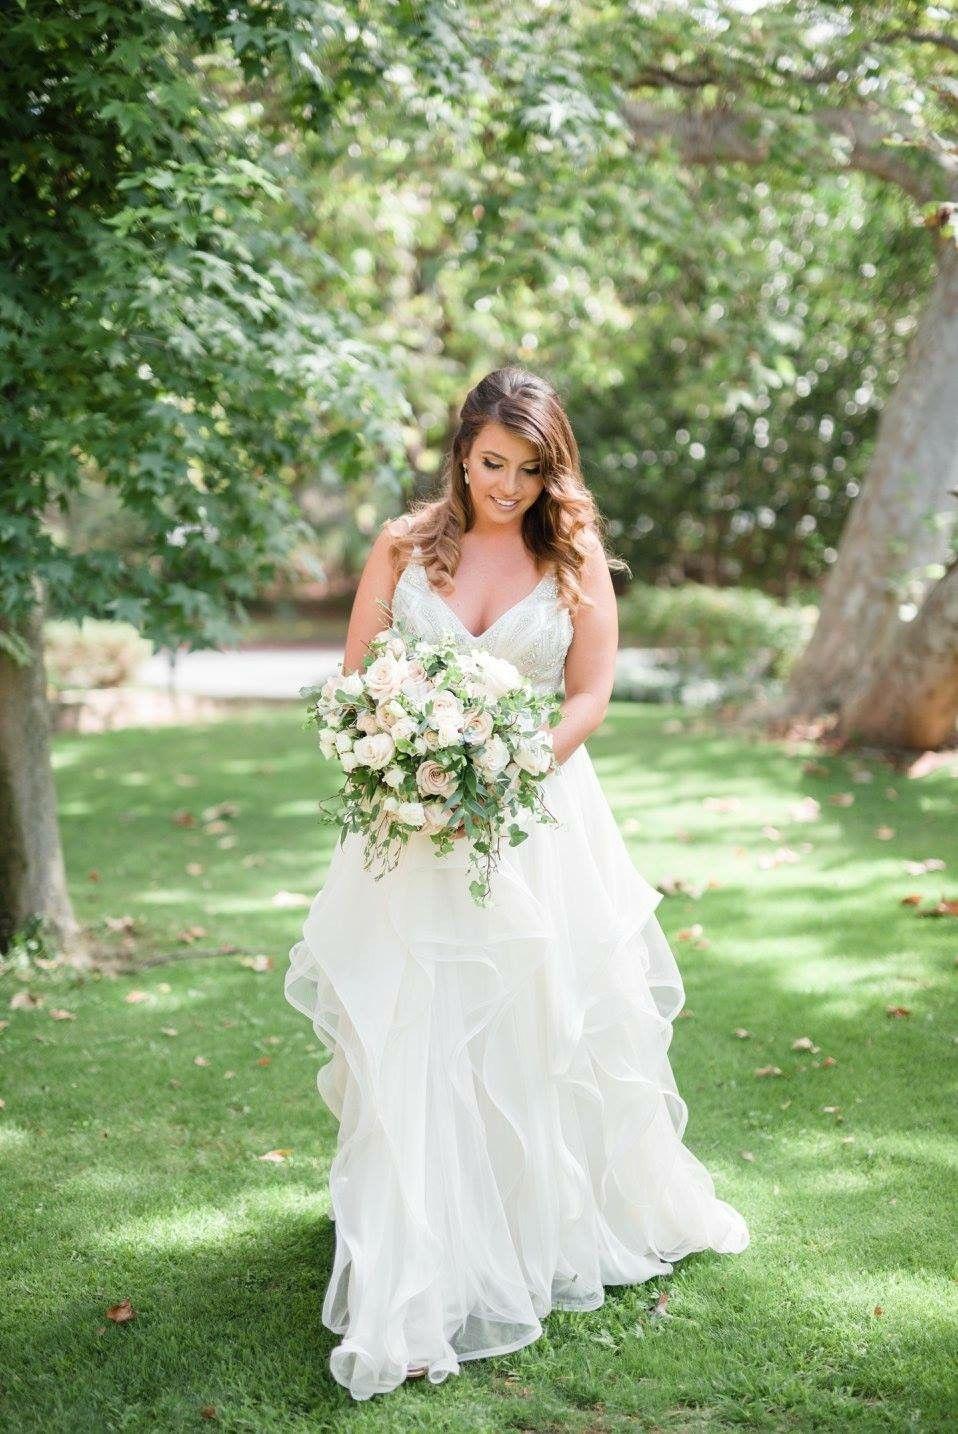 2nd hand wedding dresses Hayley Paige Luca Roxanne HP HP Second Hand Wedding Dress Still White Australia